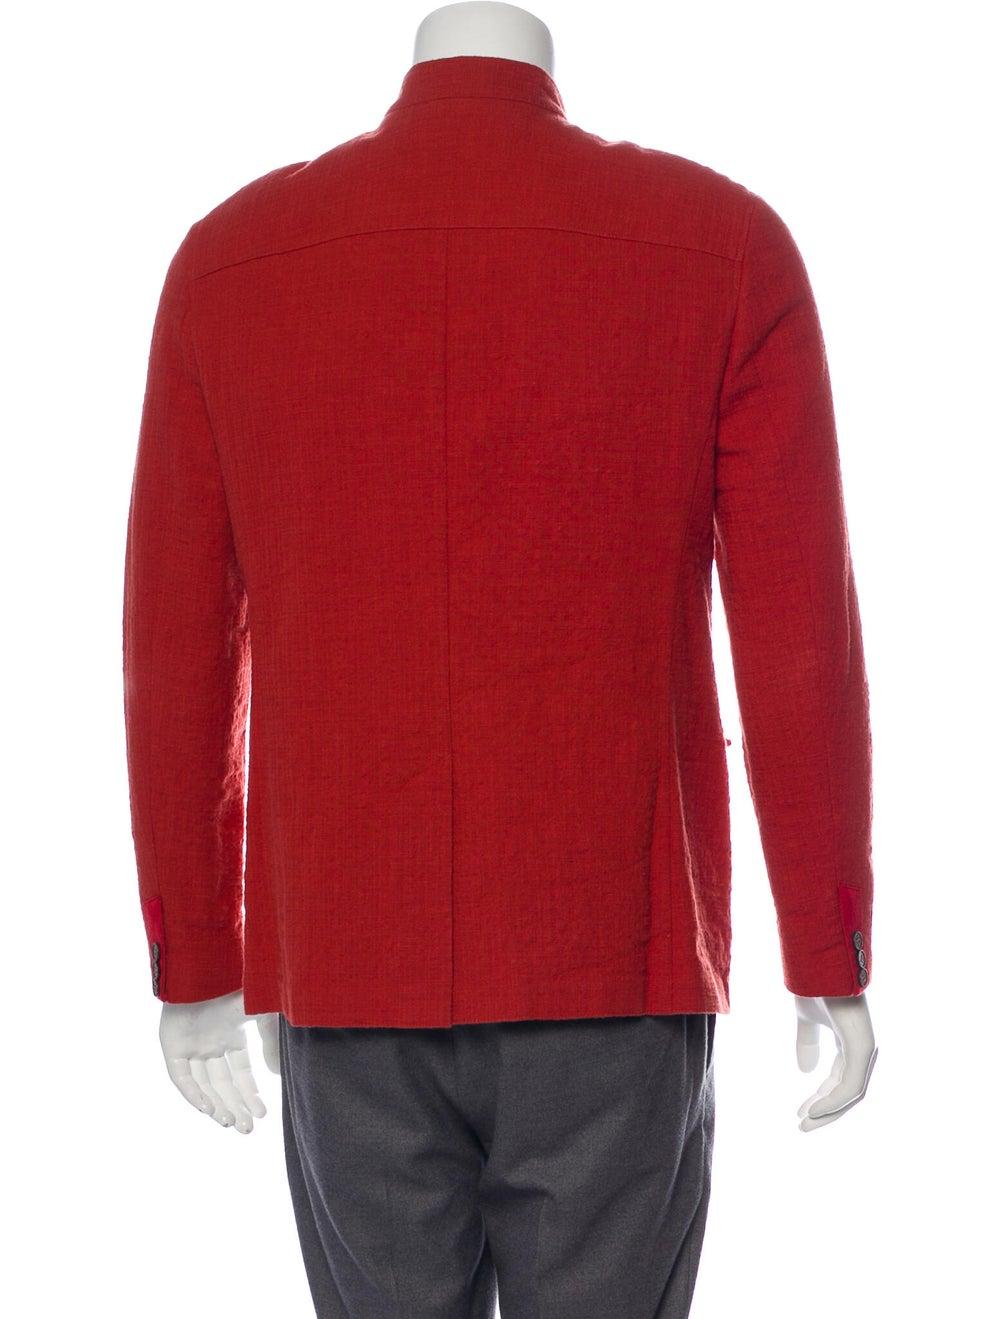 John Varvatos Deconstructed Sport Coat - image 3